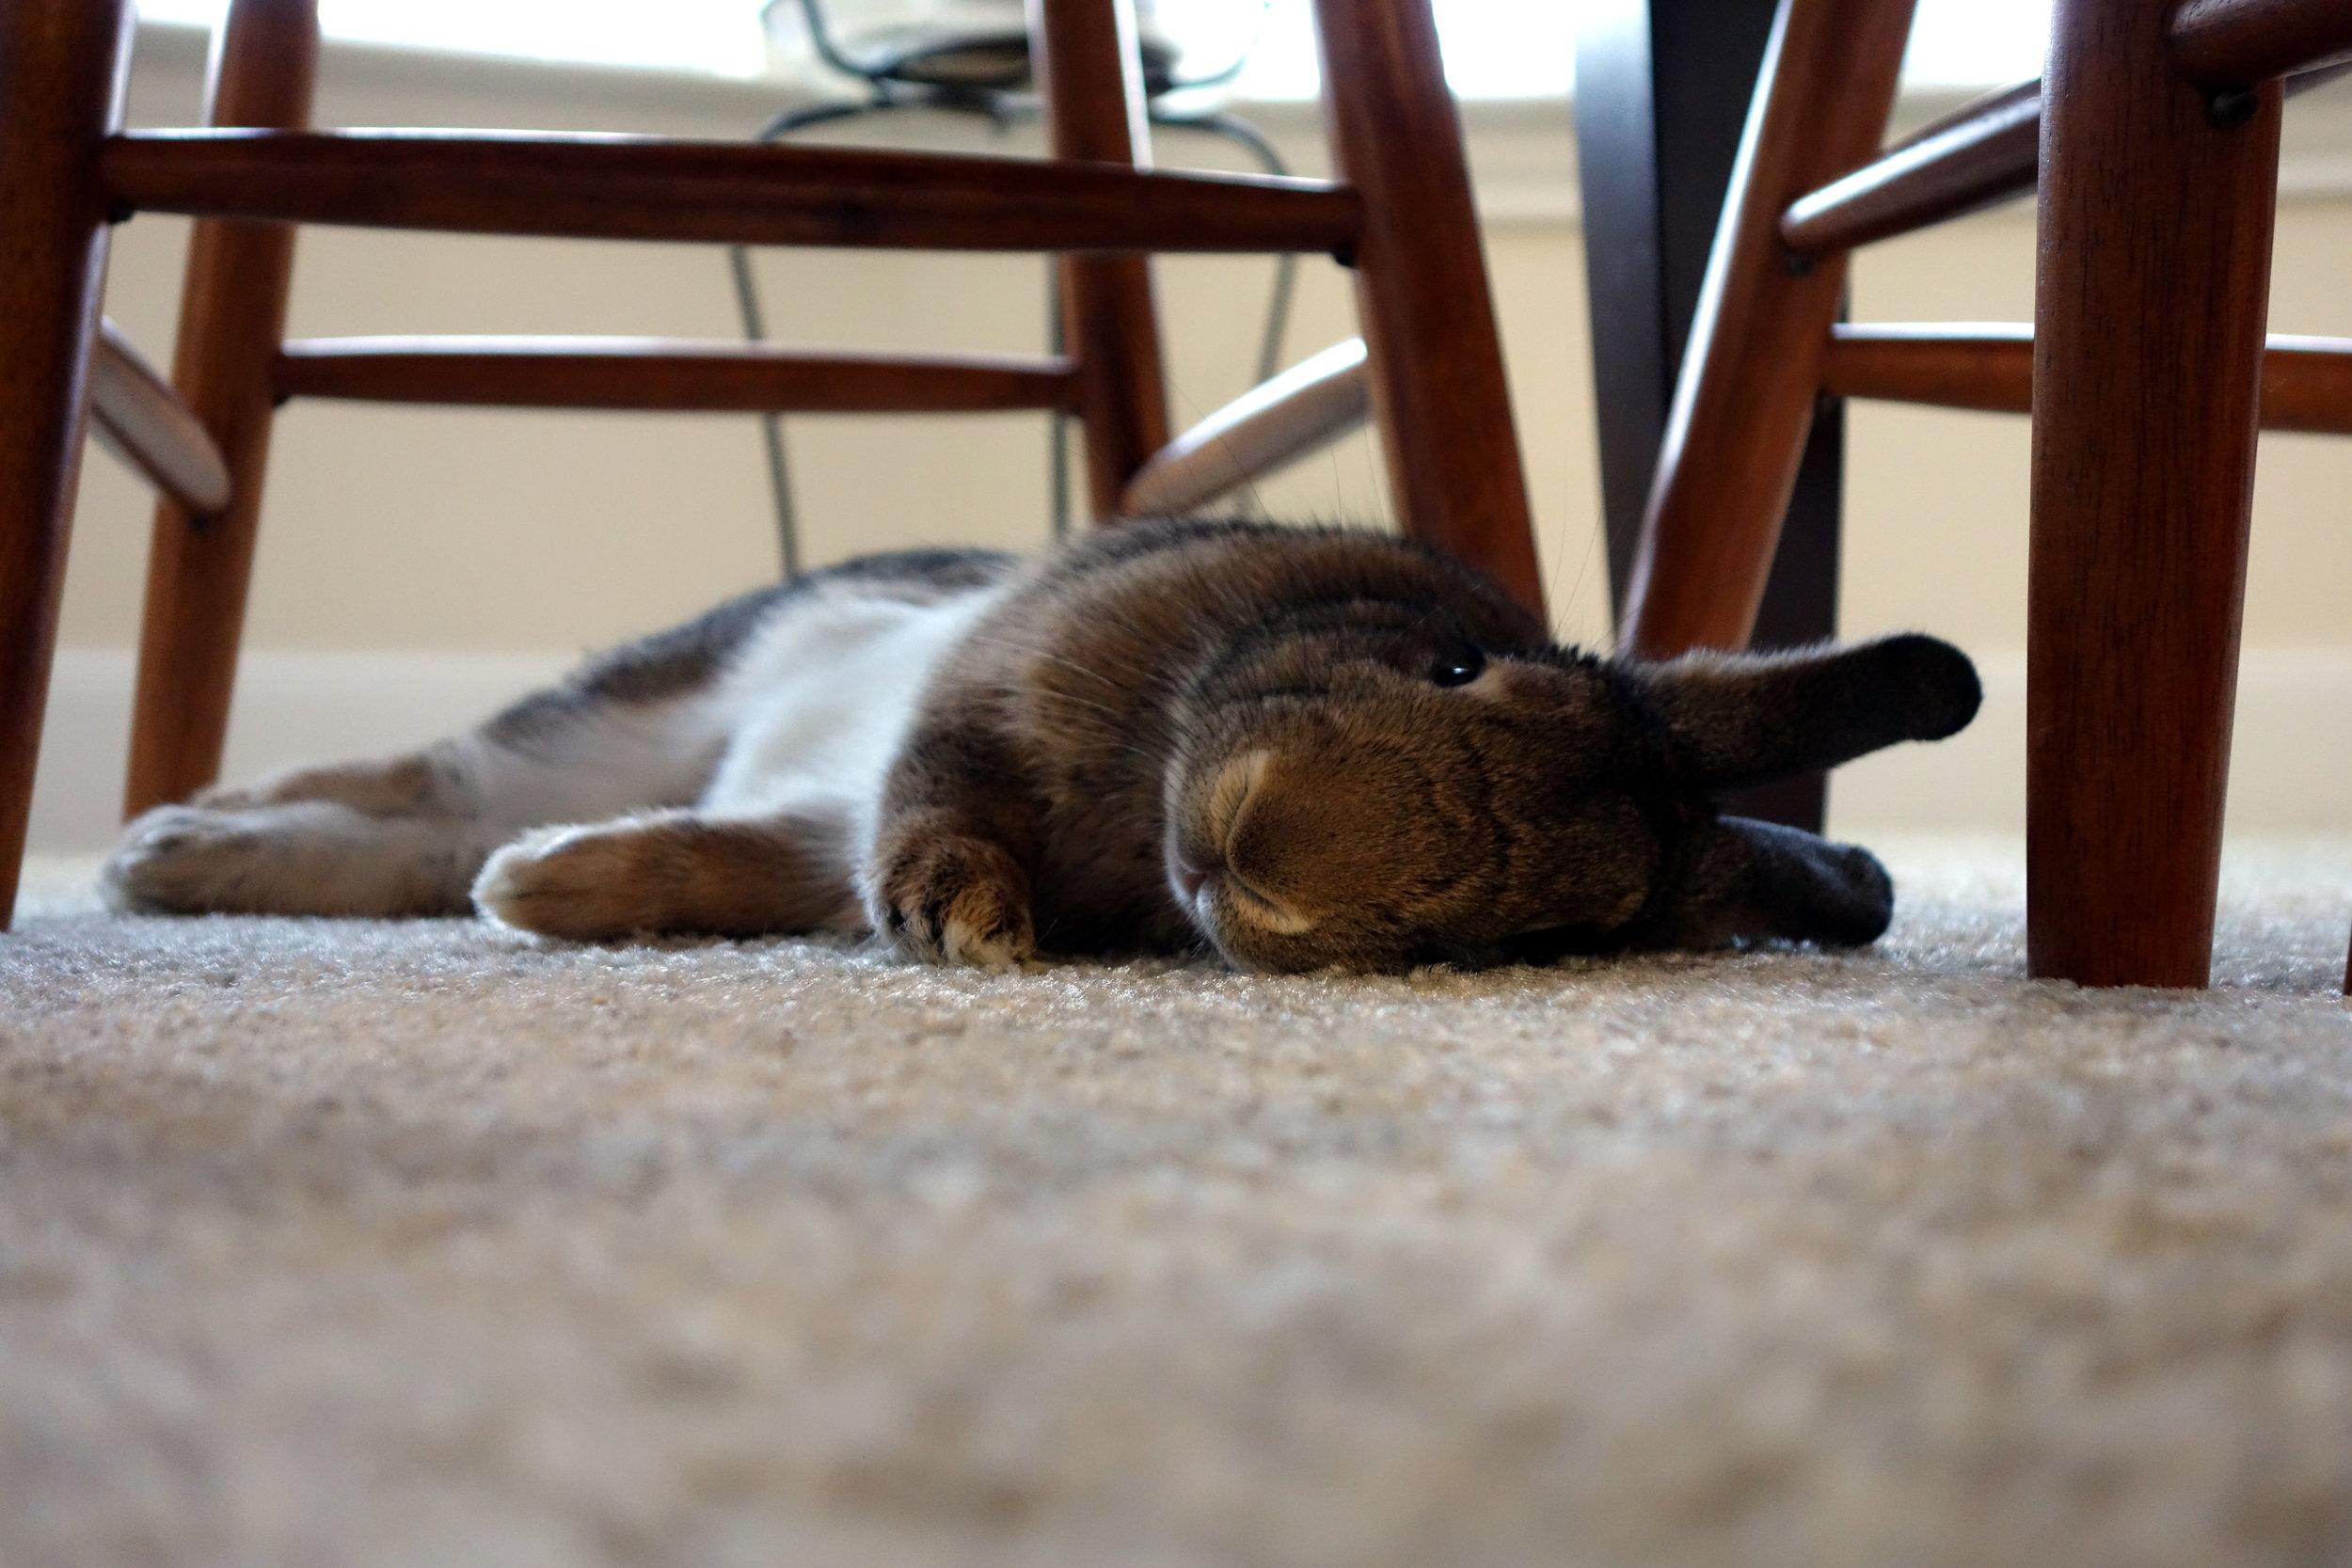 Sweet Photo of a Sleepy, Flopped Rabbit